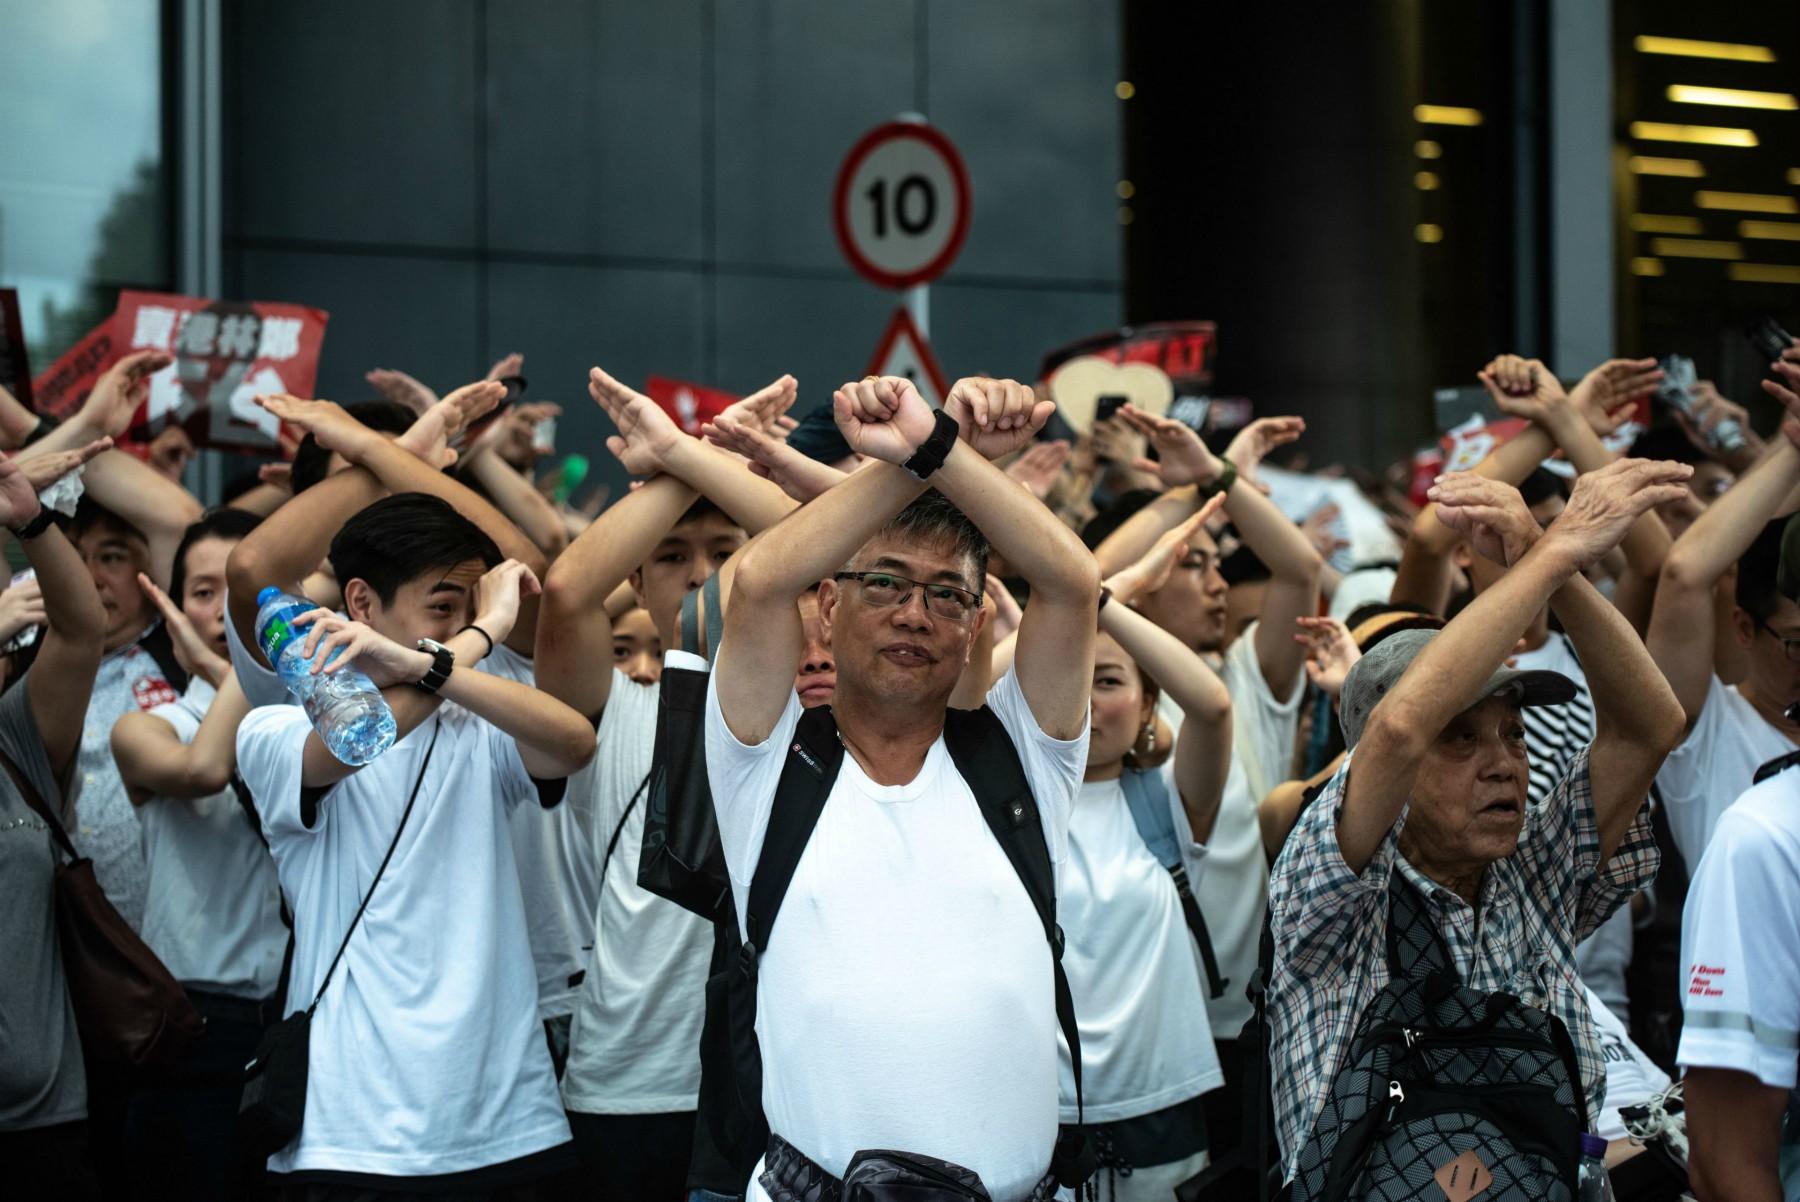 Hong Kong: scontri tra manifestanti e polizia